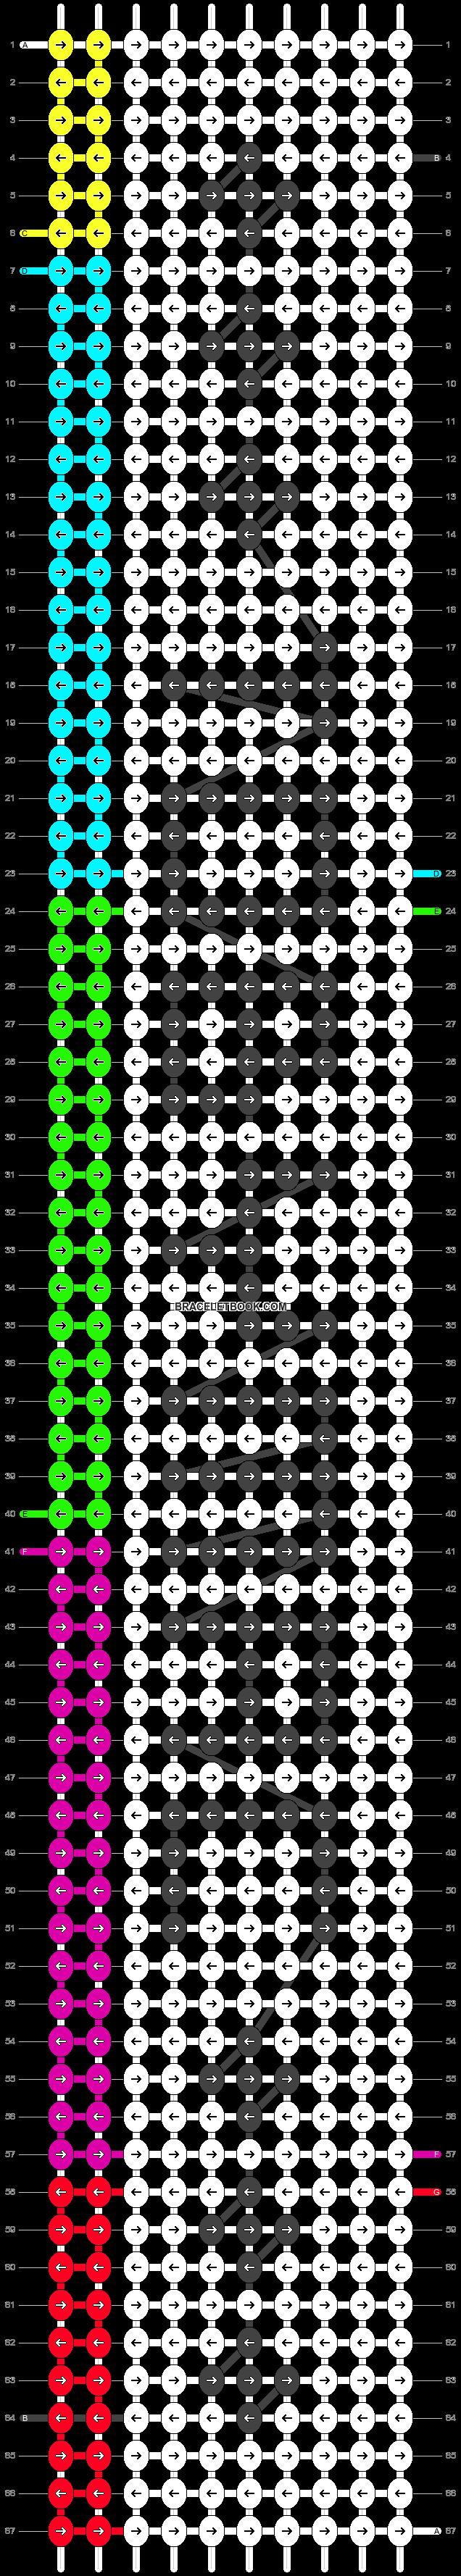 Alpha pattern #19661 pattern